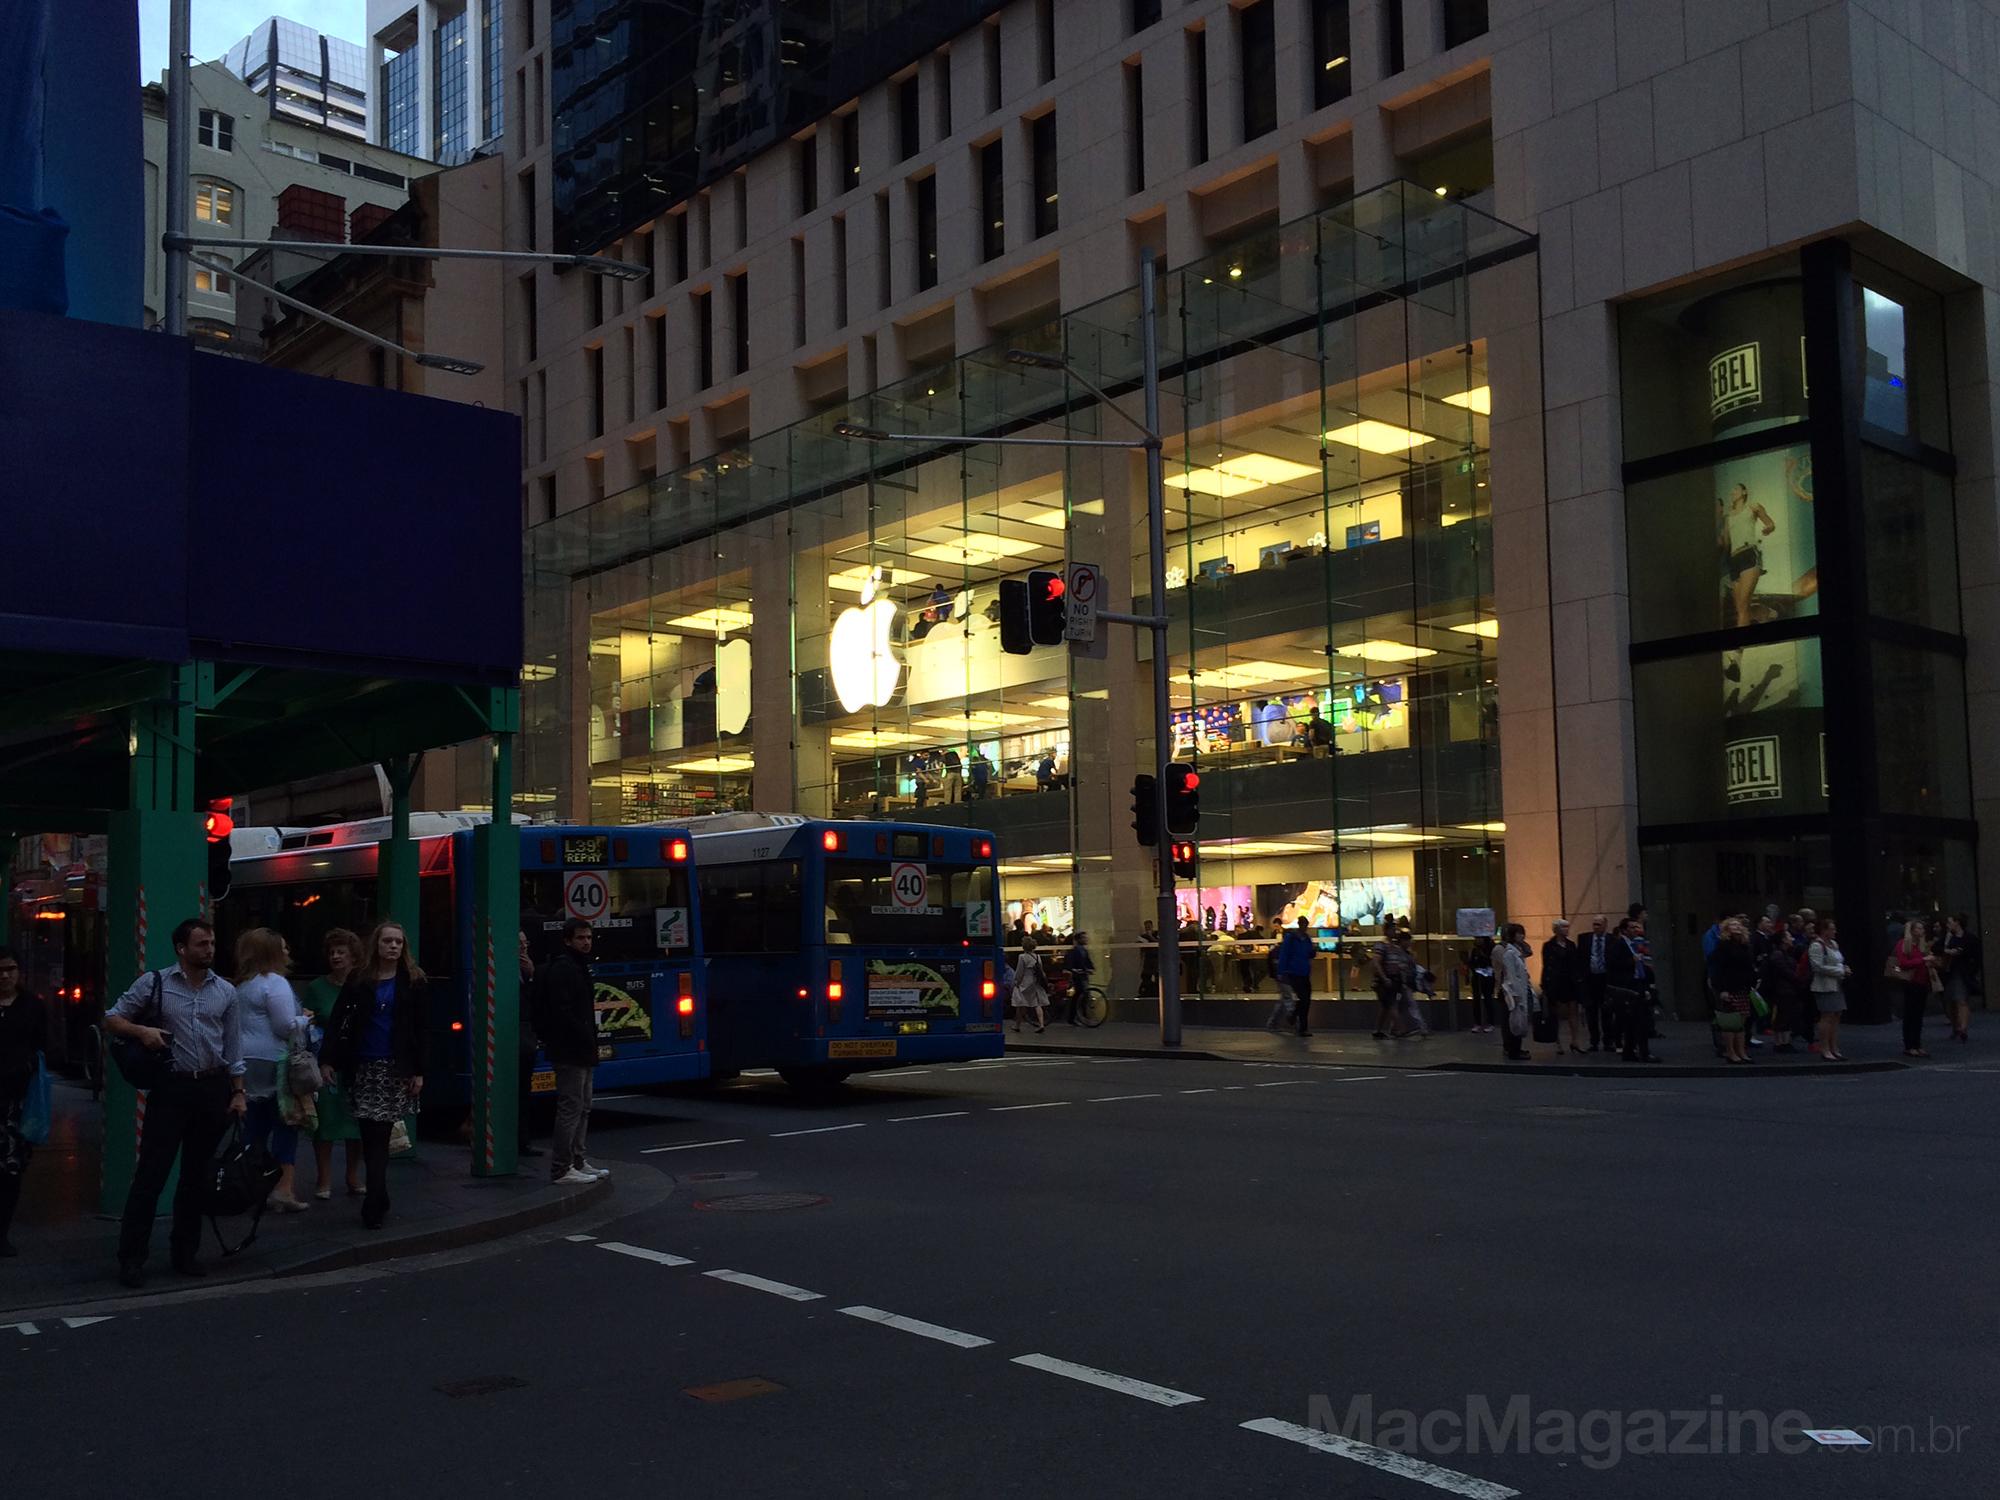 Apple Store - Sydney